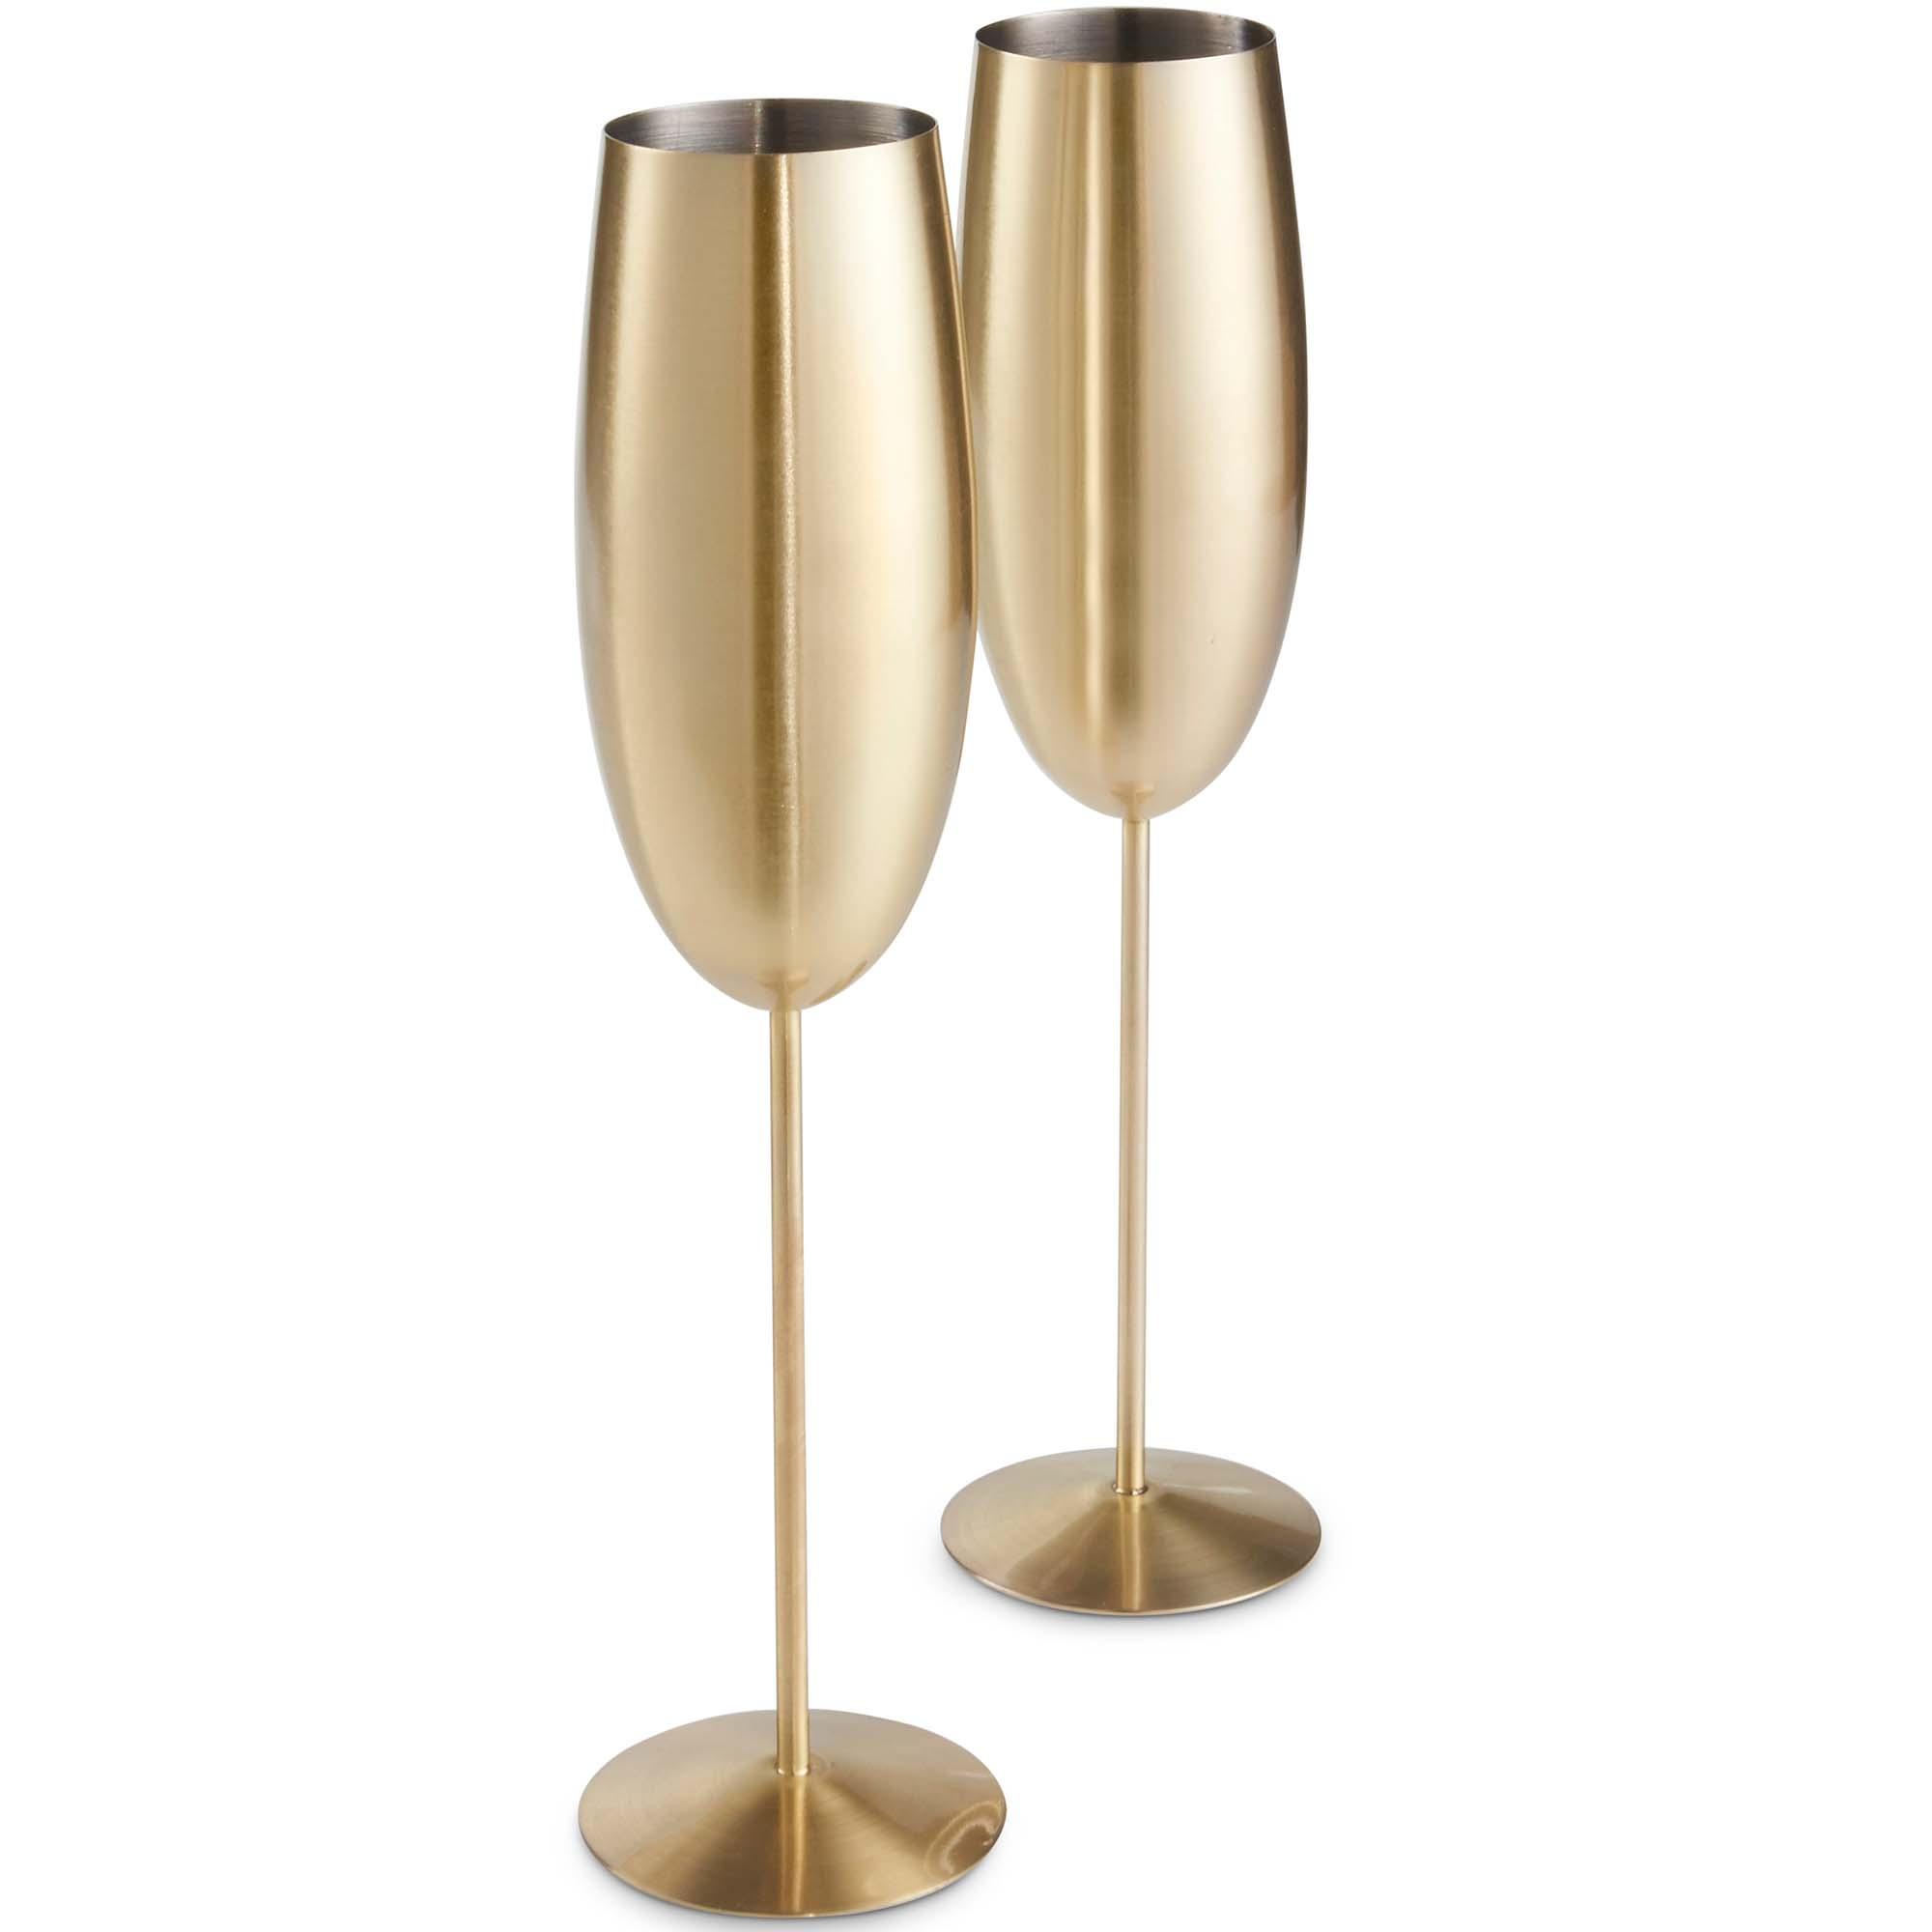 VonShef Champagne Flutes Glasses Brushed Gold Stainless ...